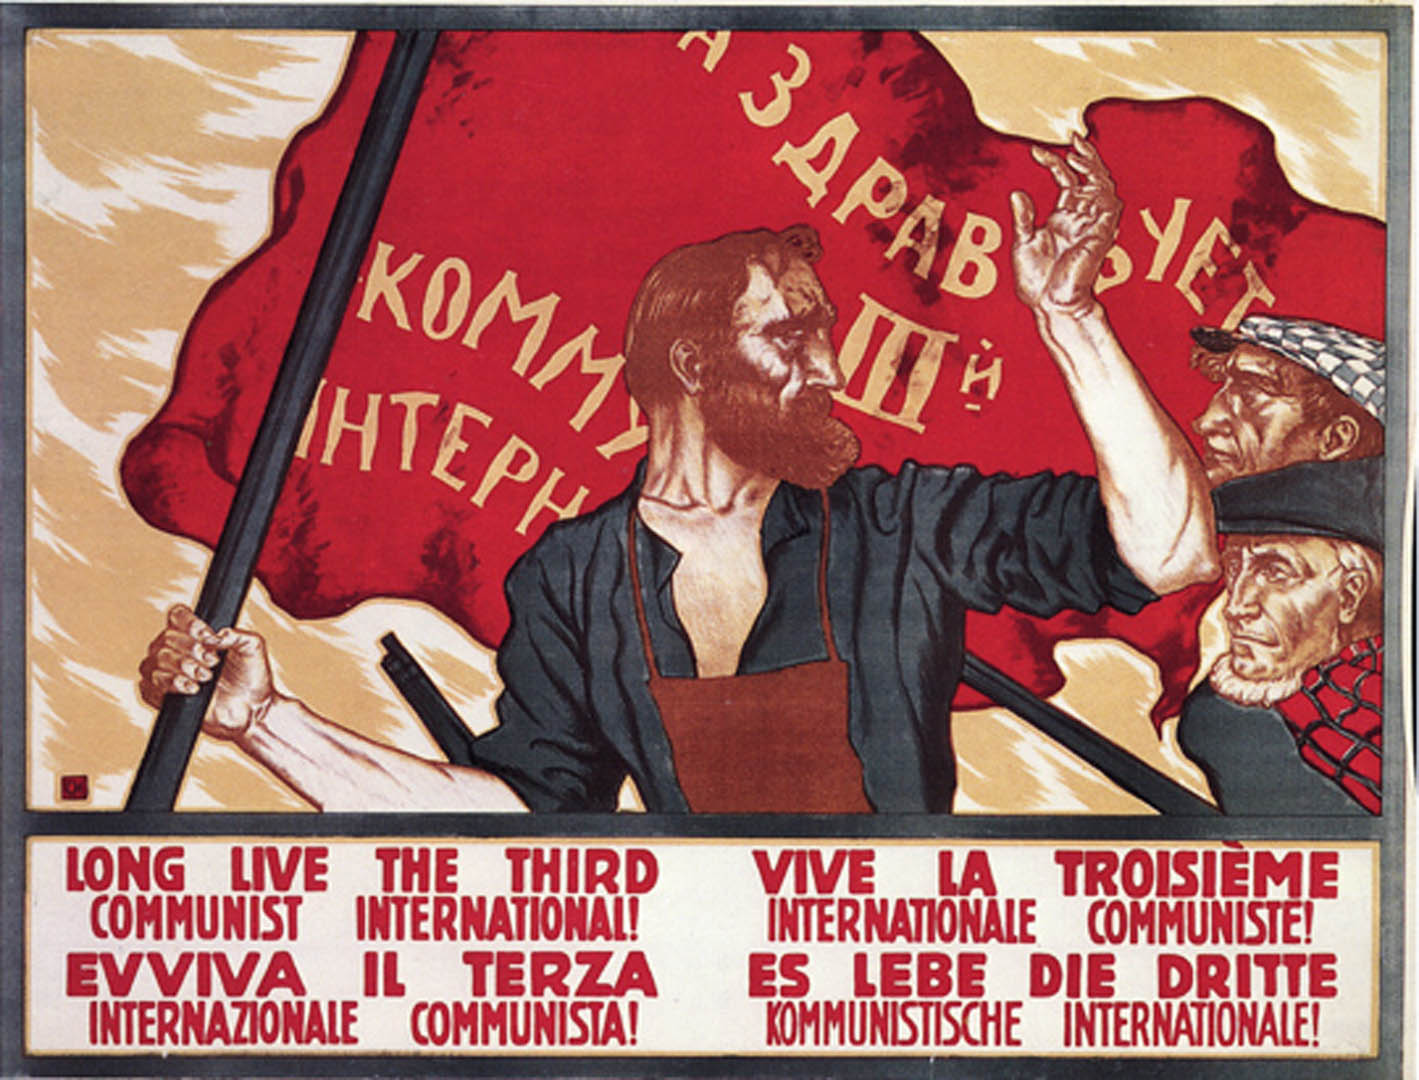 third-international-communist-meeting